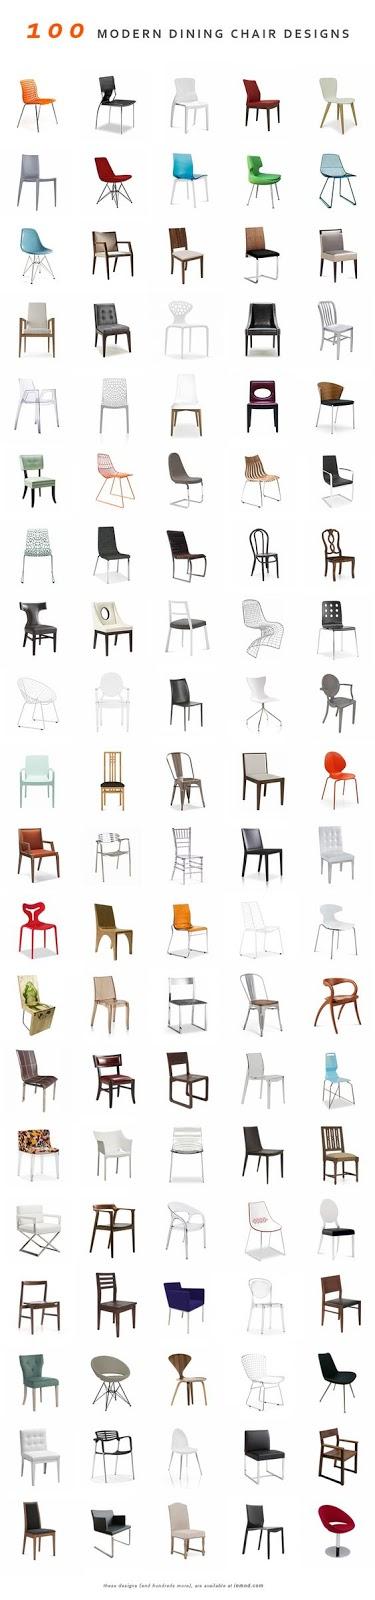 100 Macam Desain Kursi Kayu Gratis Terbaru